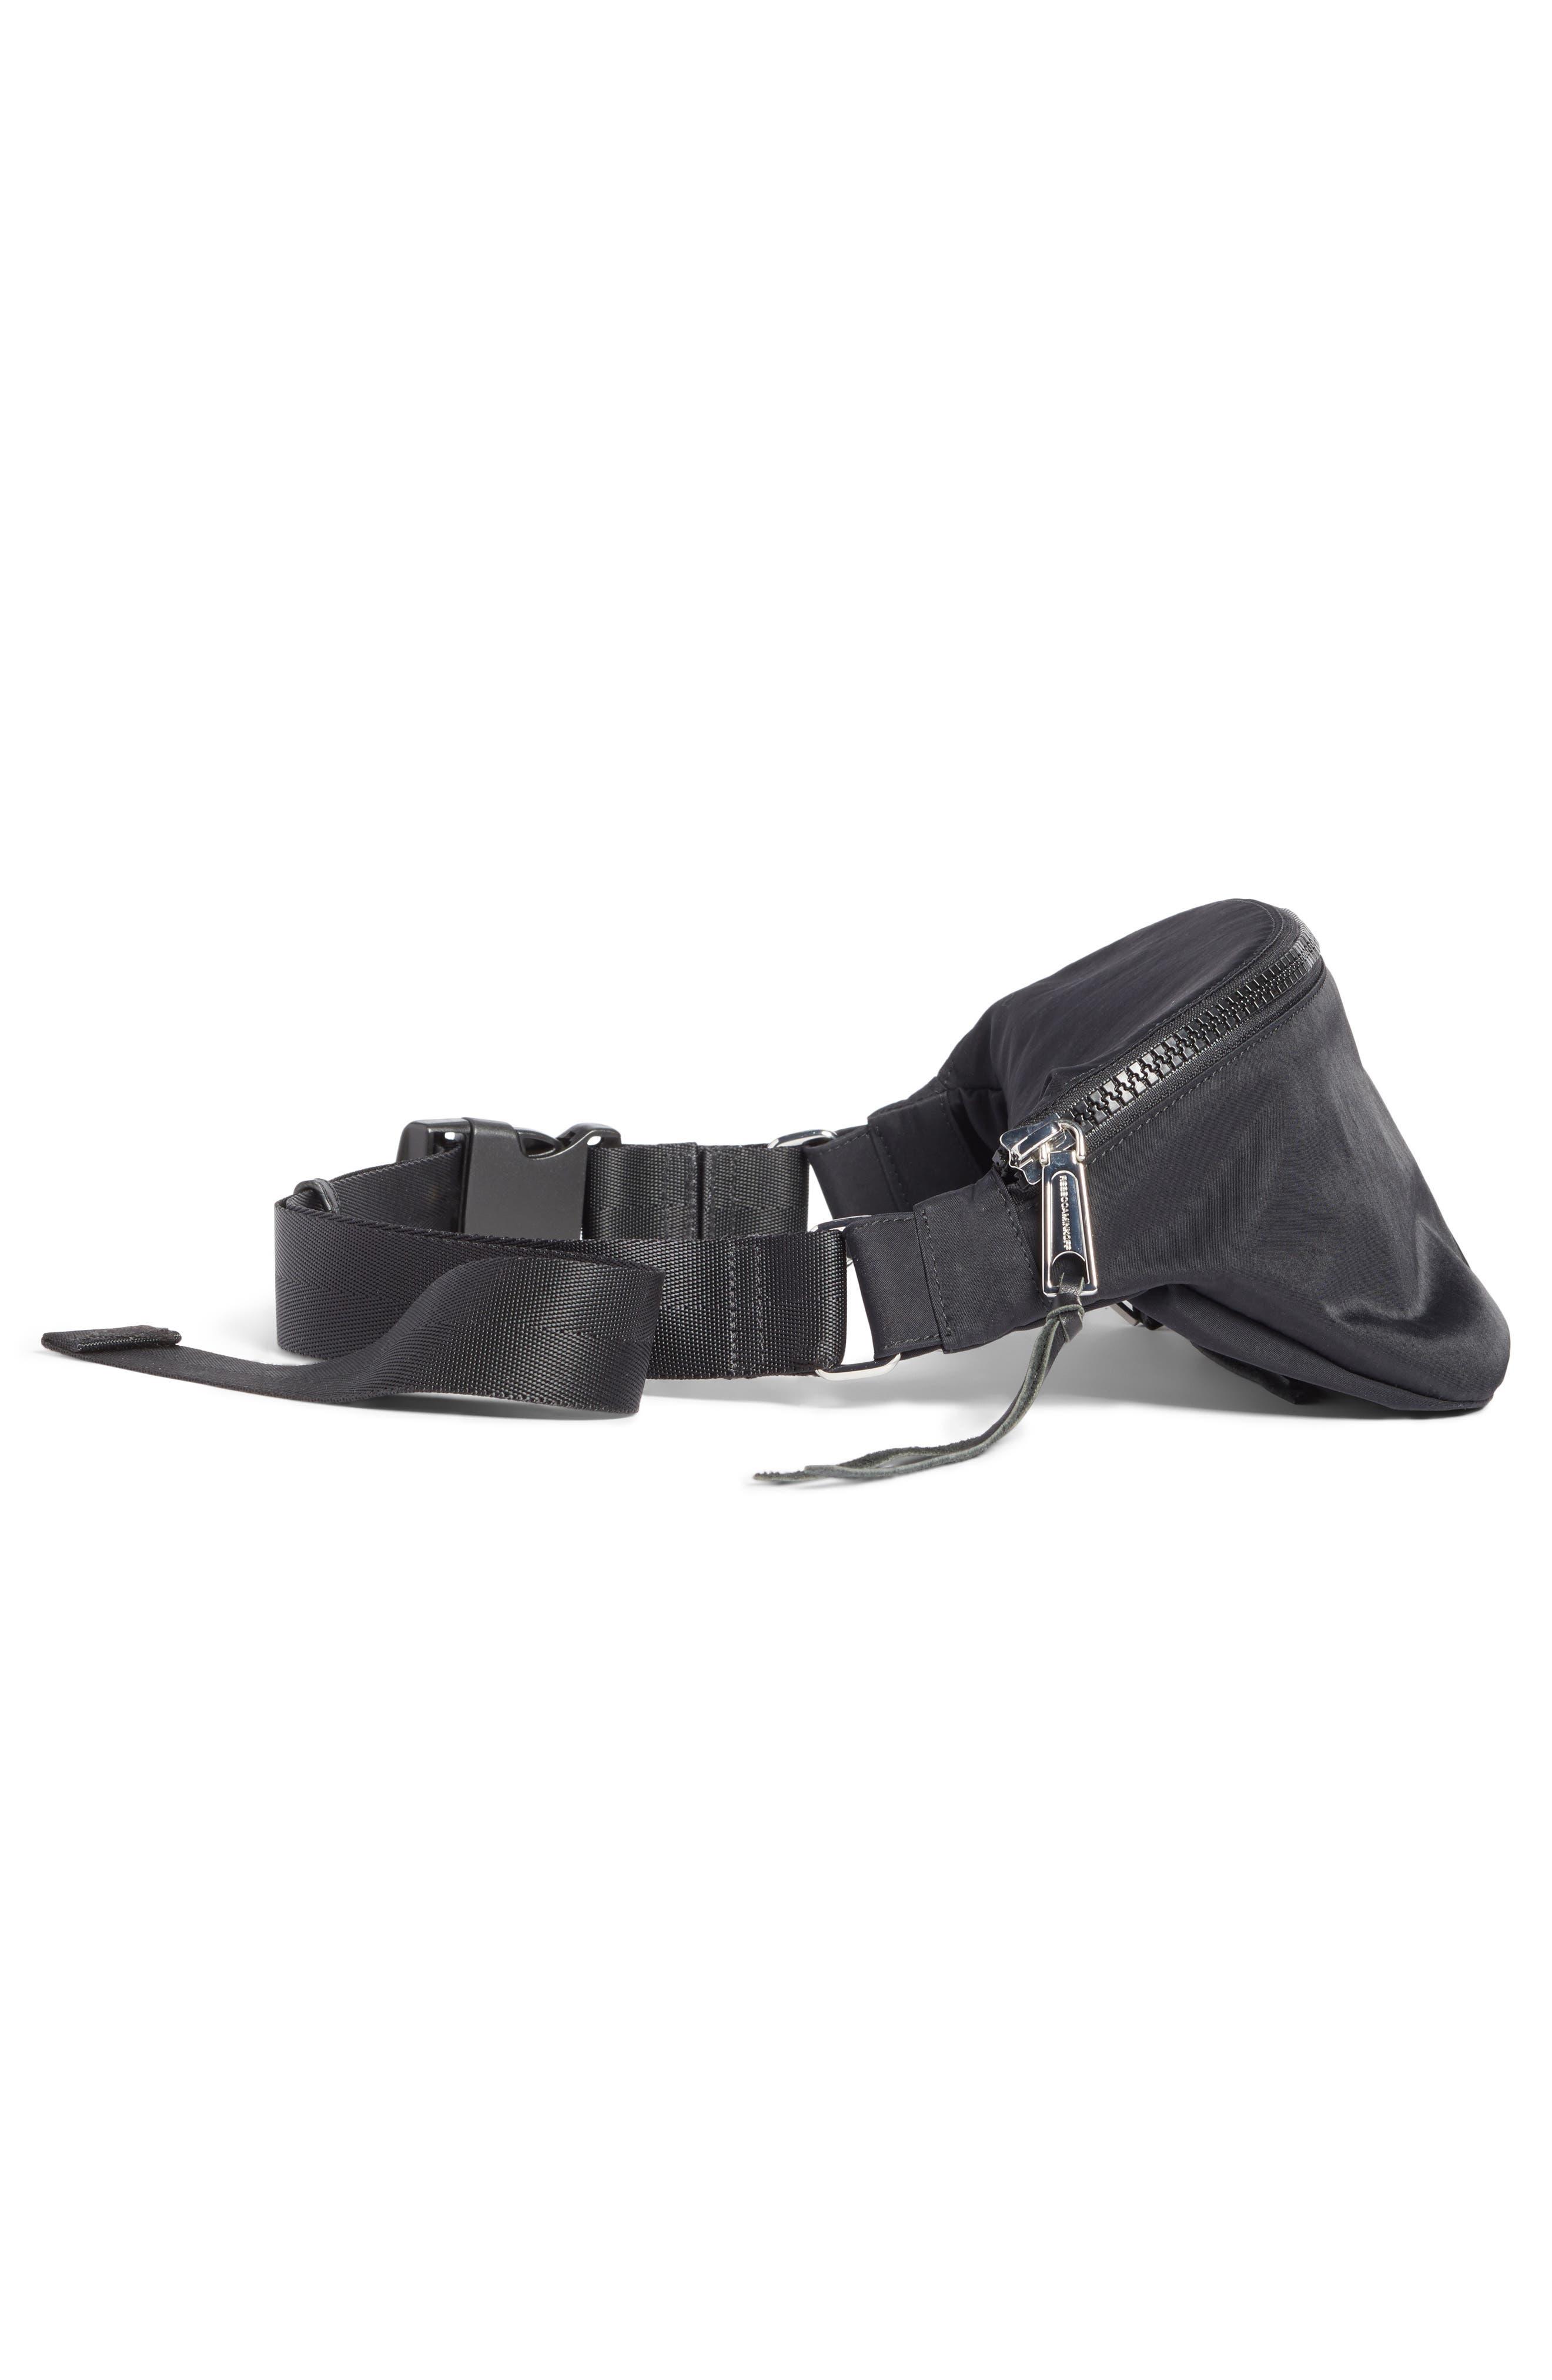 REBECCA MINKOFF, Nylon Belt Bag, Alternate thumbnail 6, color, BLACK